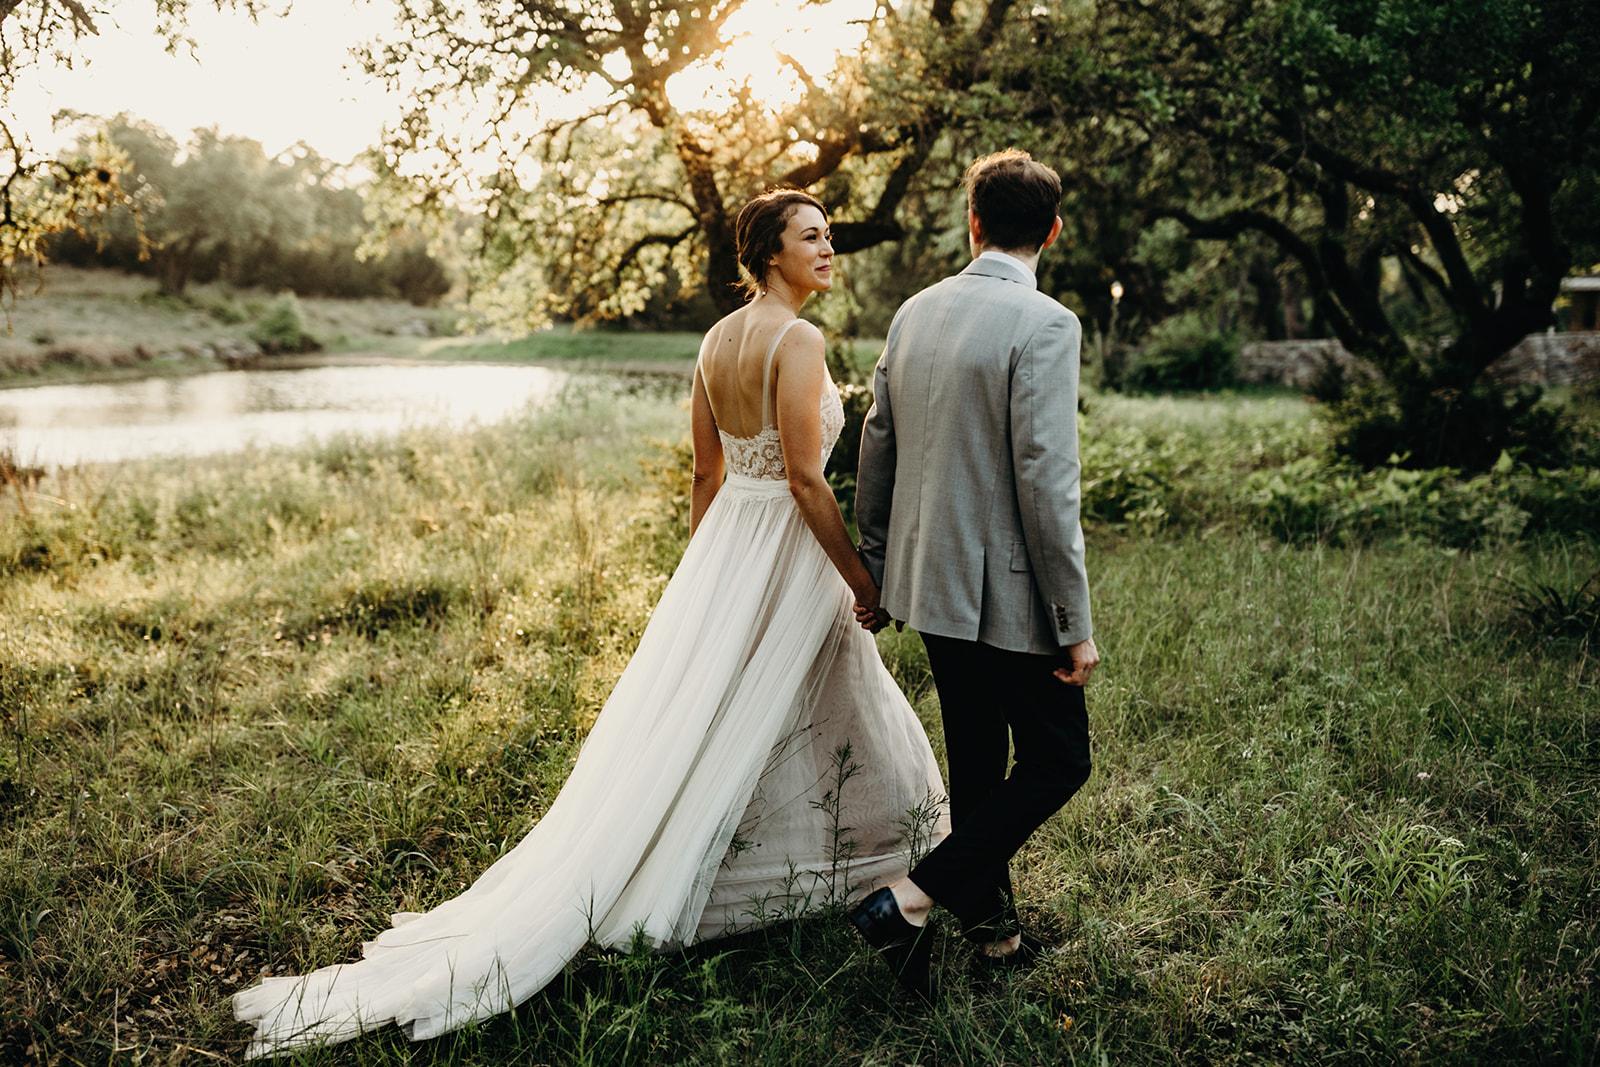 austin-wedding-lindsey-bryce-525.jpg